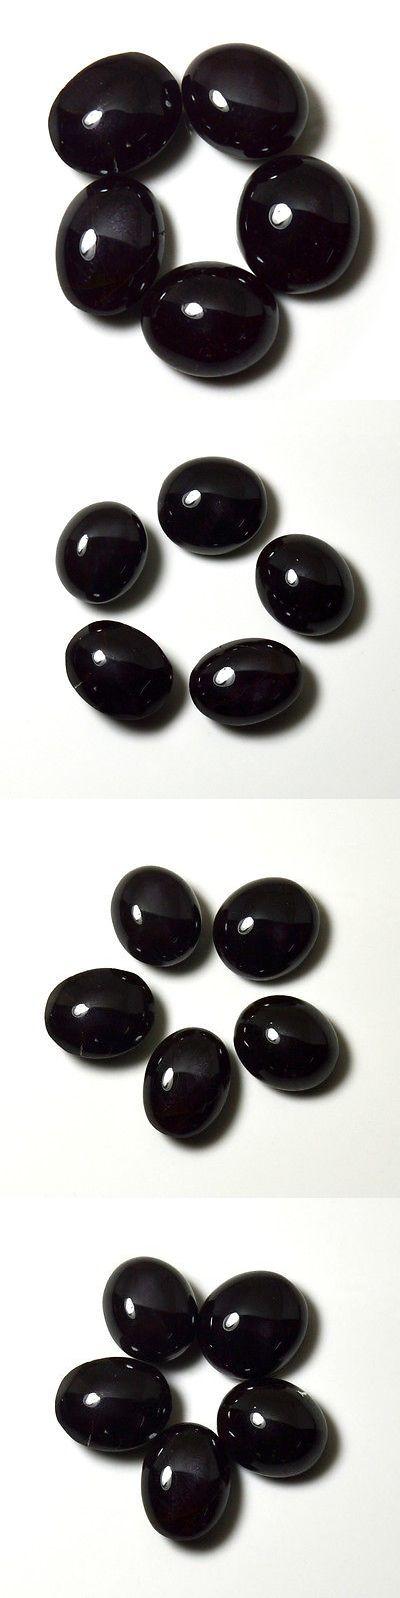 Cats Eye Quartz 69163: 80 Ct 5 Pcs Sulemani Cat Eye Stone Oval Black Natural Loose Gemstone Lot 2Mu -> BUY IT NOW ONLY: $54.8 on eBay!